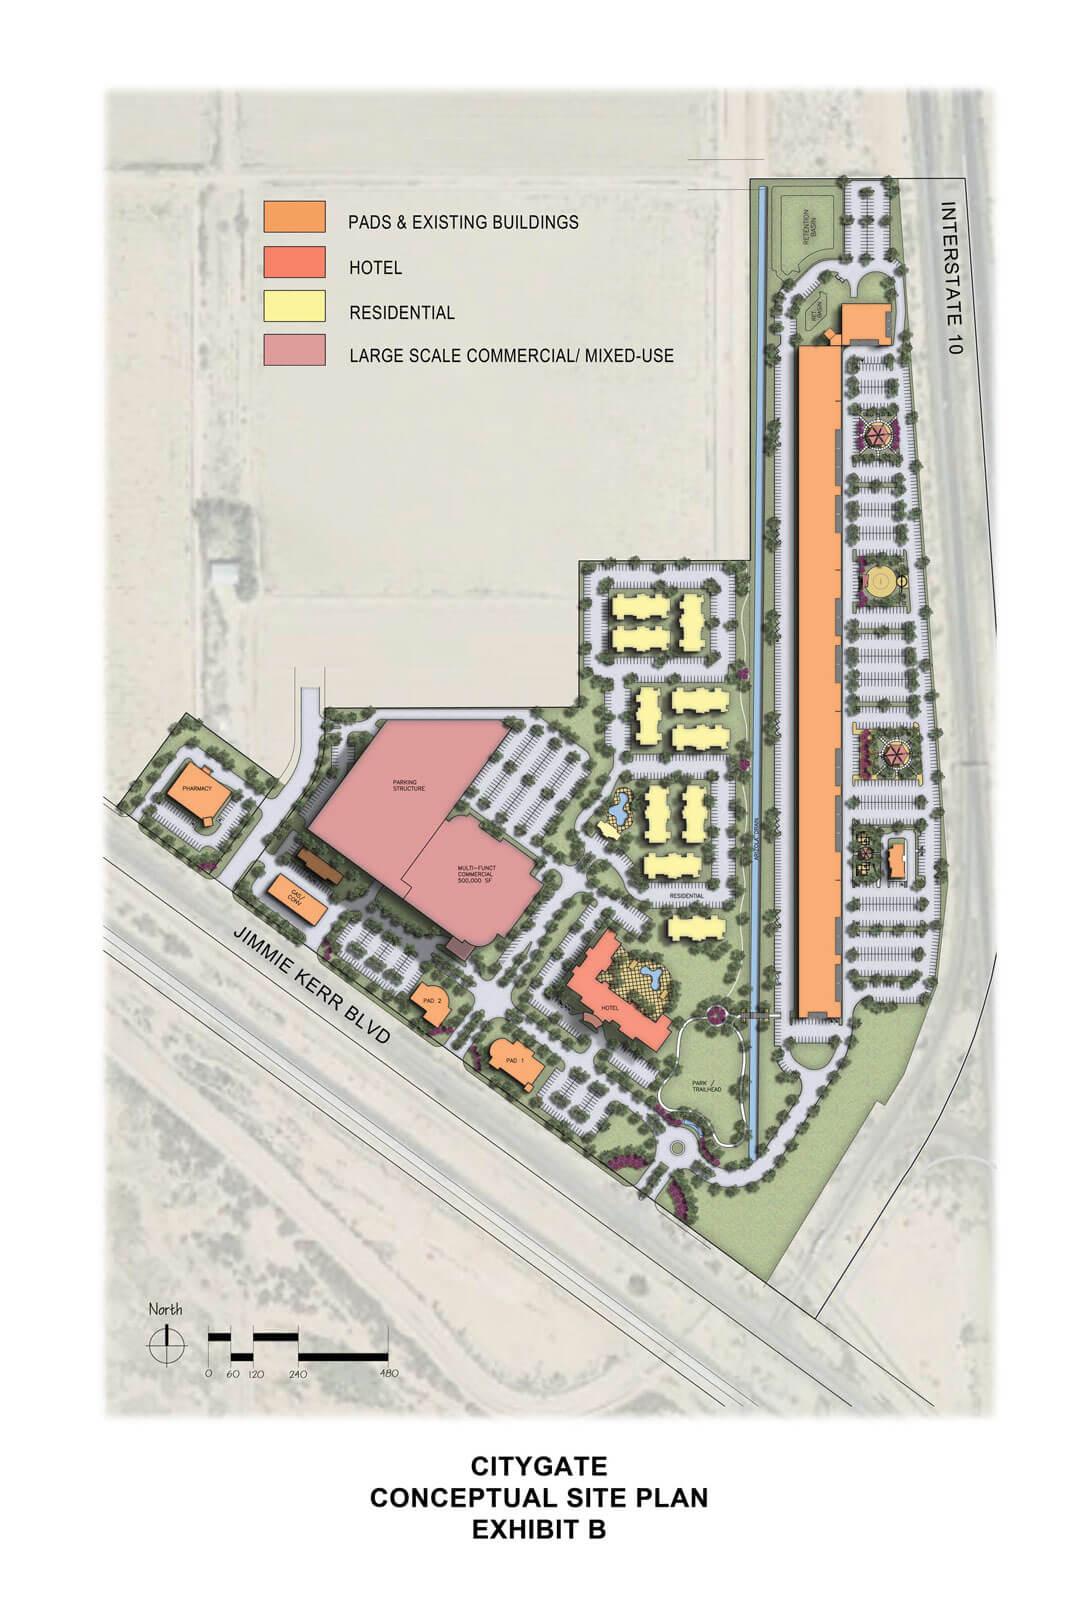 CityGate PAD (Exhibit B Conceptual Site Plan)